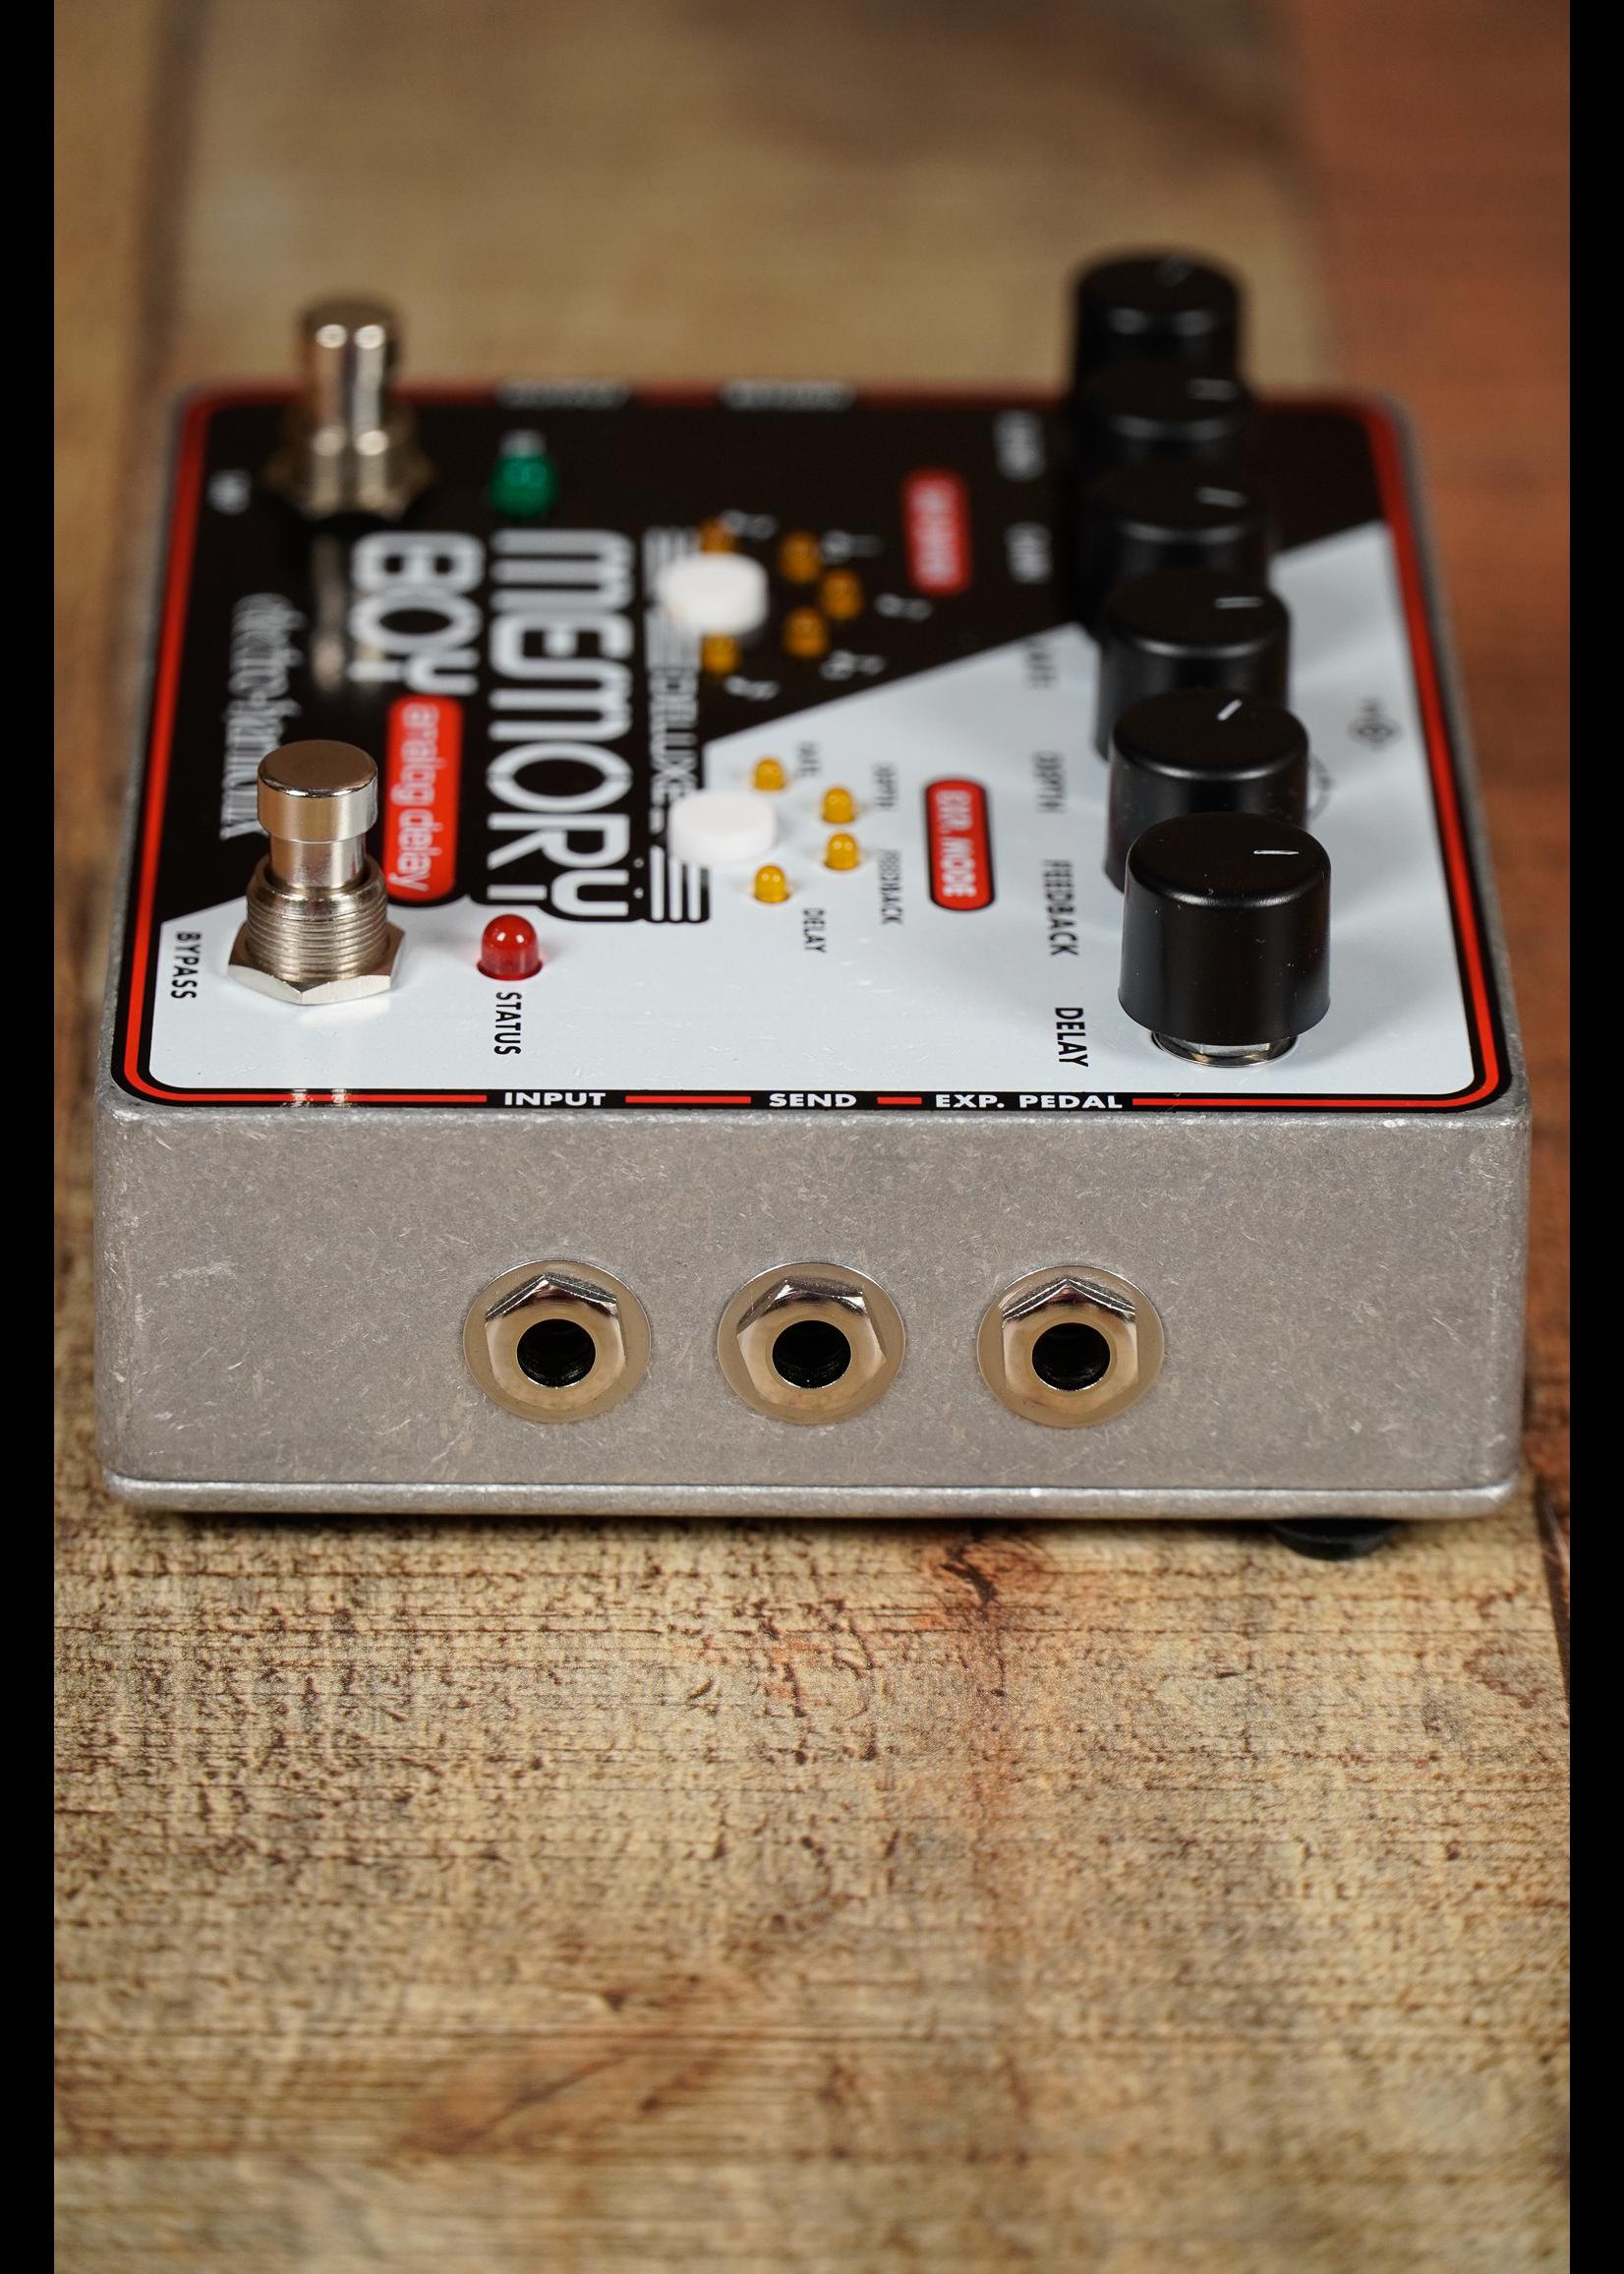 Electro-Harmonix Electro-Harmonix Deluxe Memory Boy Analog Delay